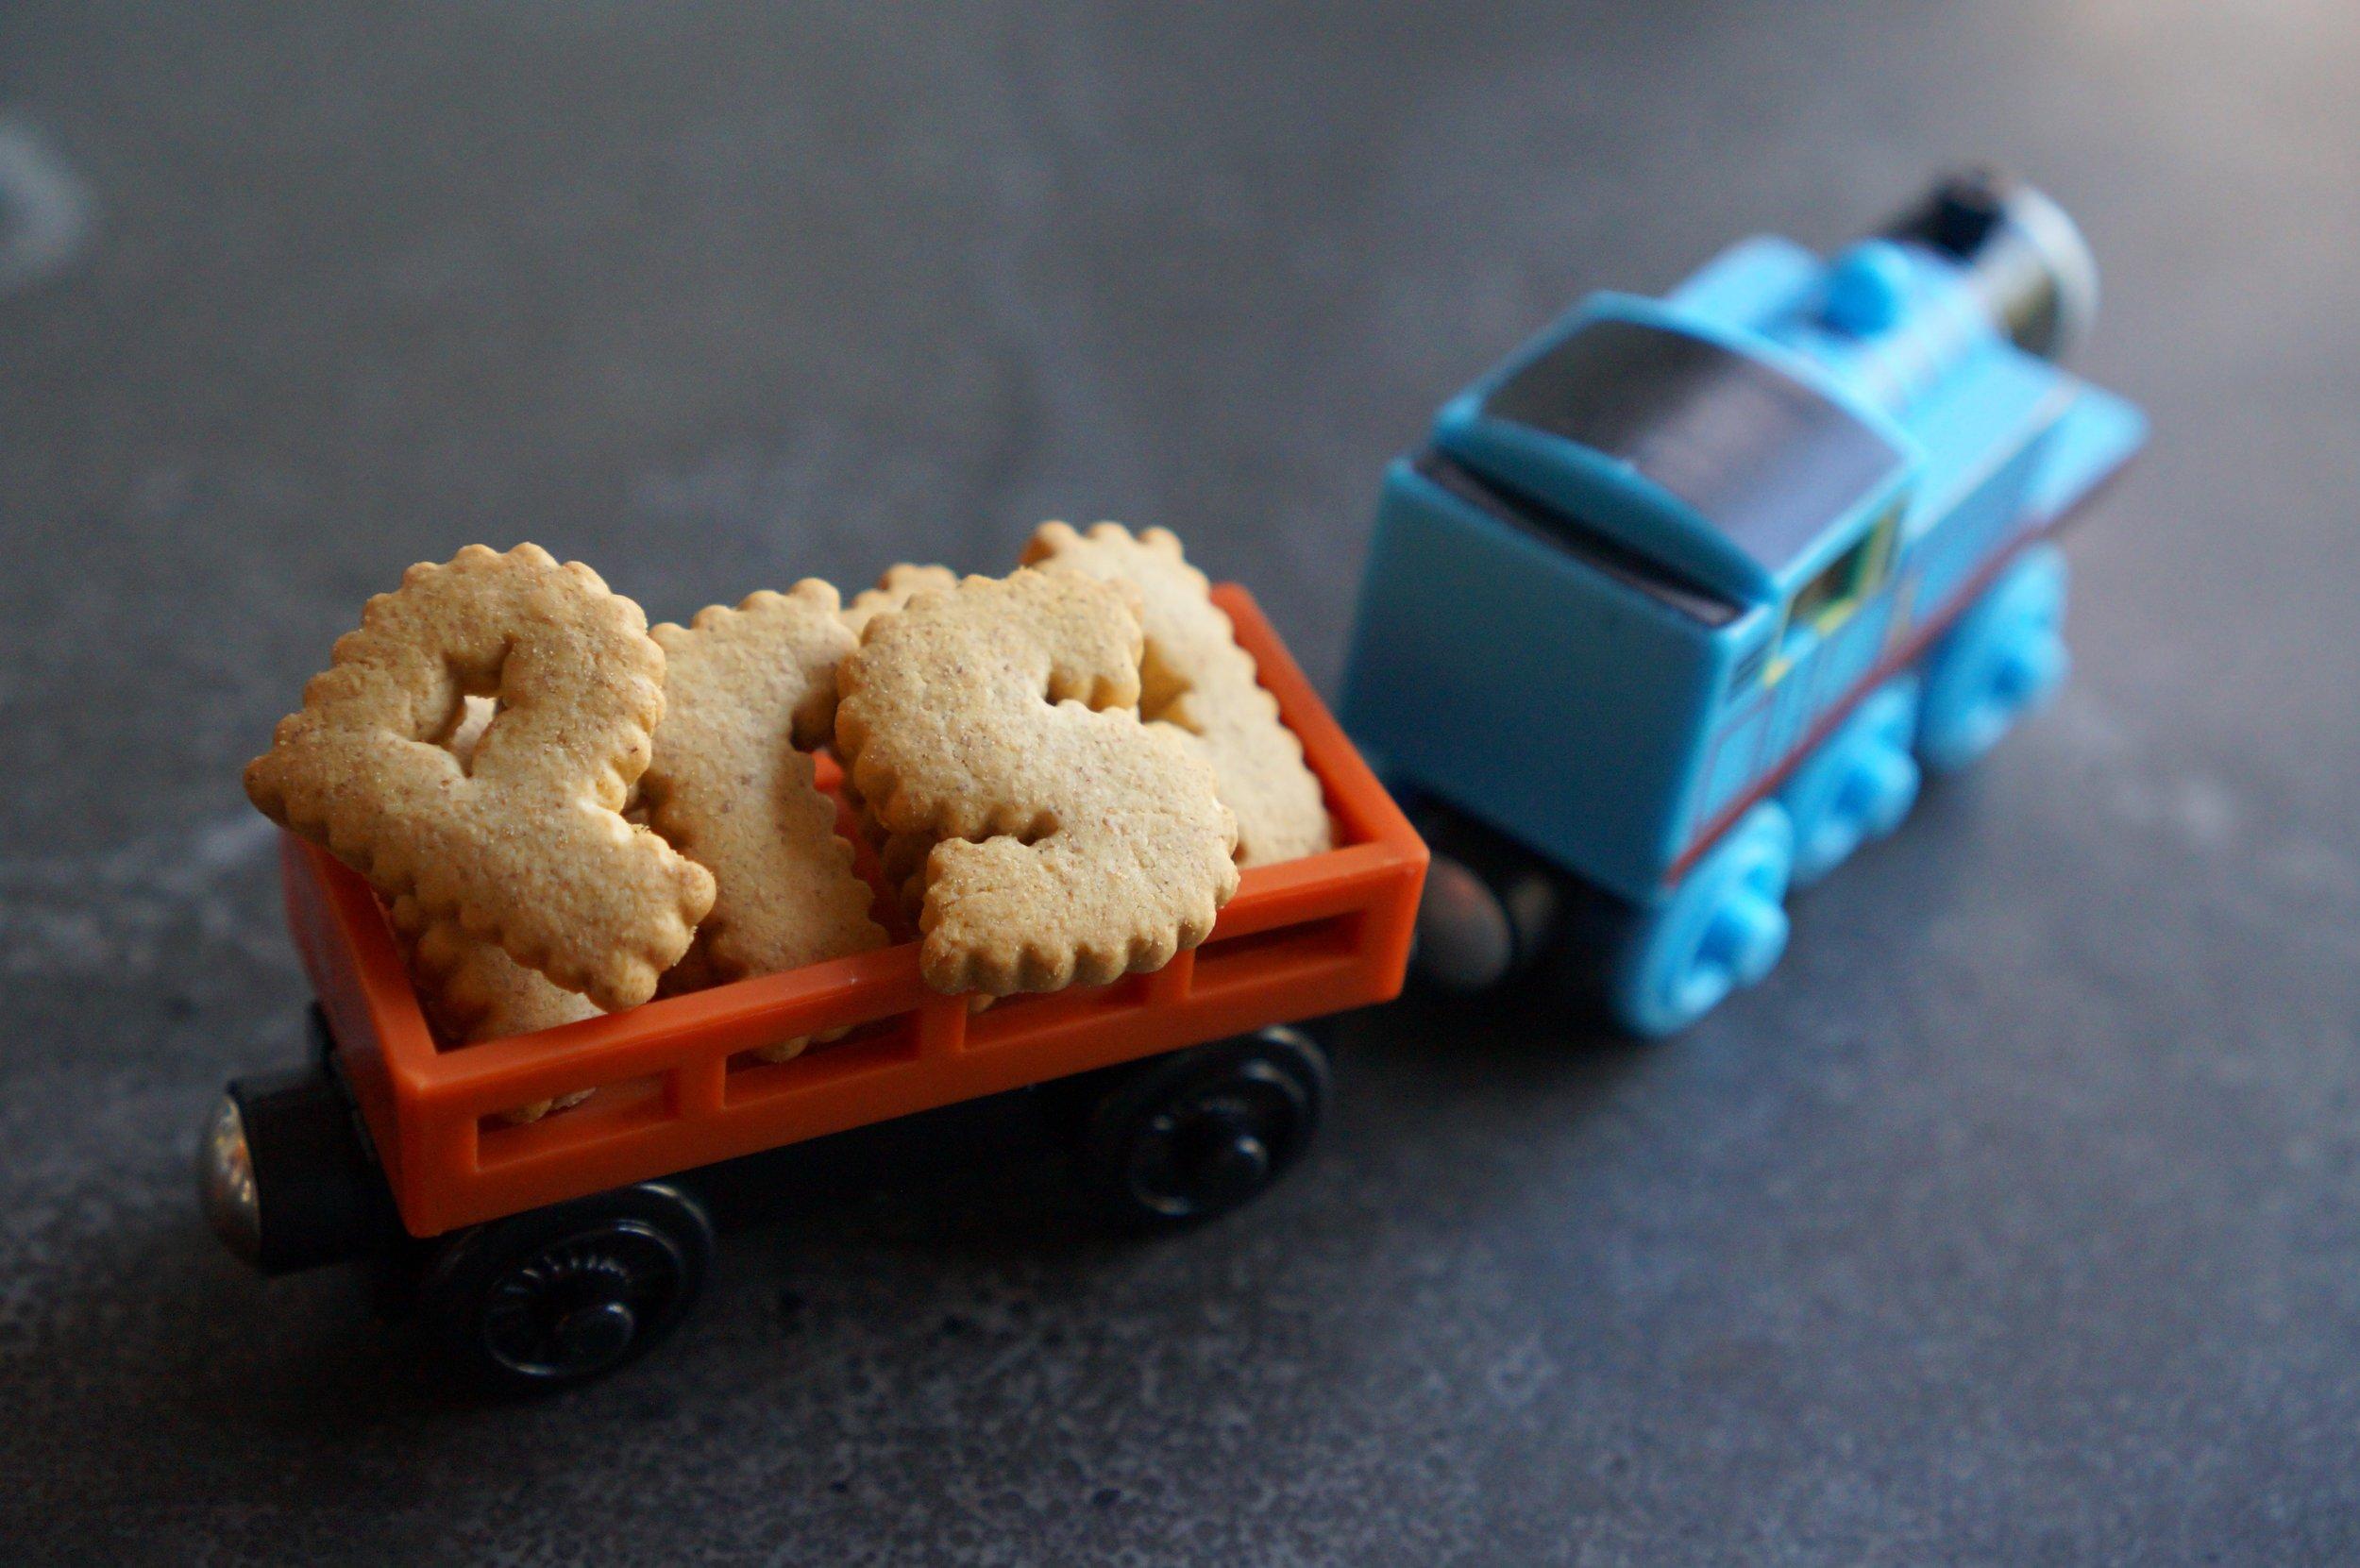 Cargo cars help kids develop new narratives.